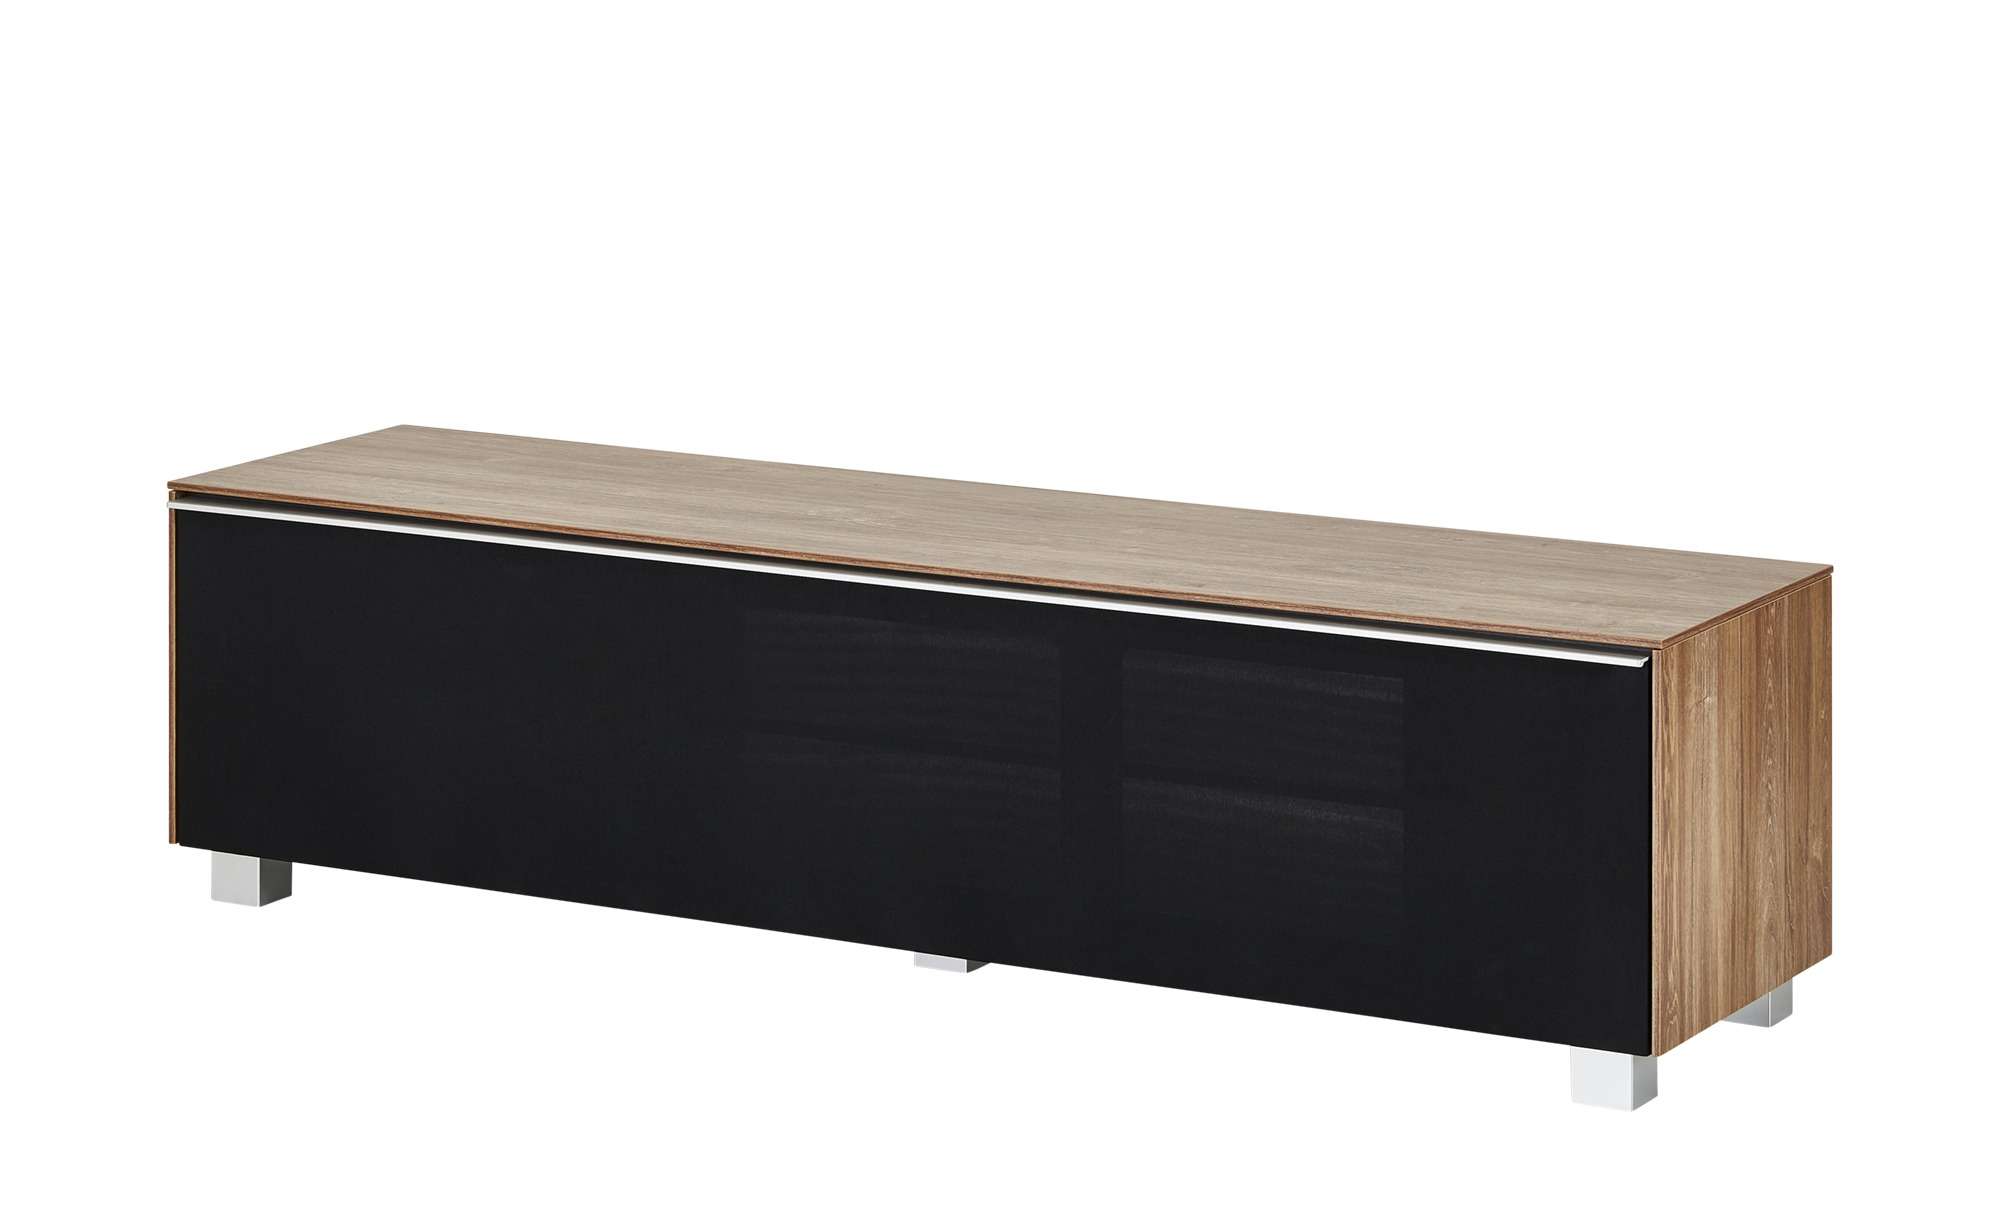 Soundboard  Soundbase M-Wood ¦ holzfarben ¦ Maße (cm): B: 160 H: 43 T: 42 TV- & Media Möbel > TV-Racks - Höffner